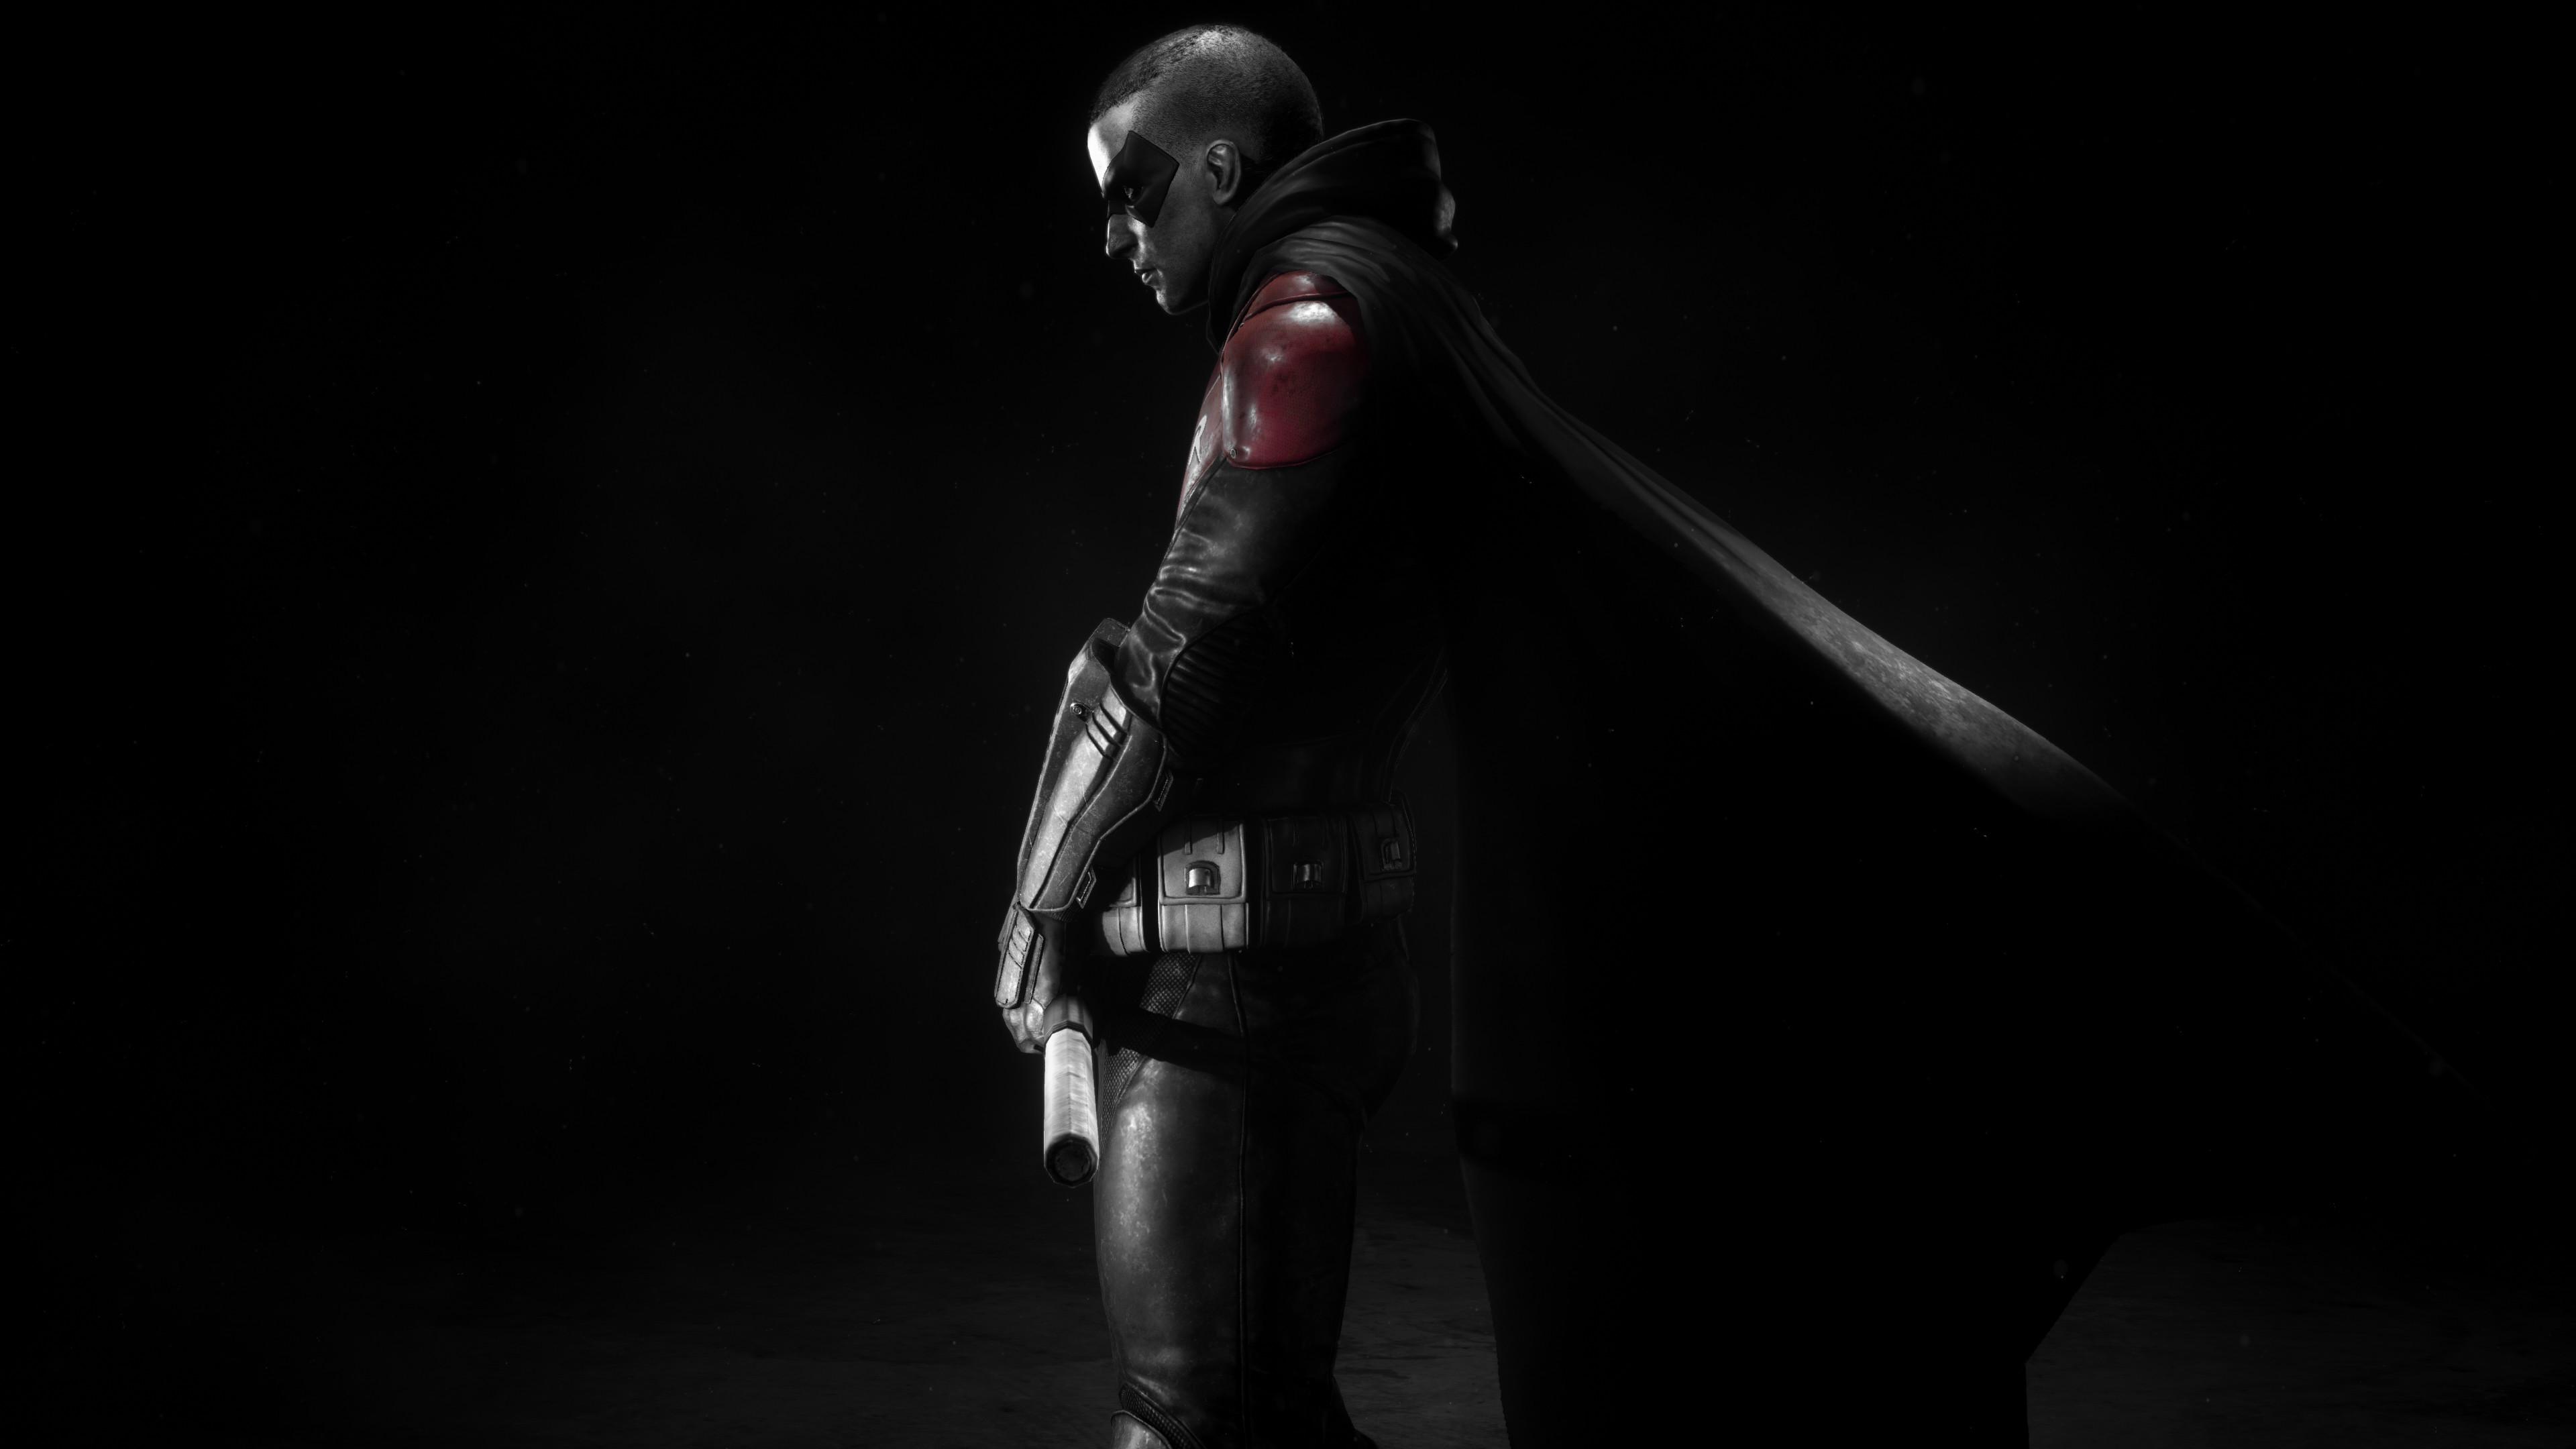 40169327774_bde355b0be_4k.jpg - Batman: Arkham Knight